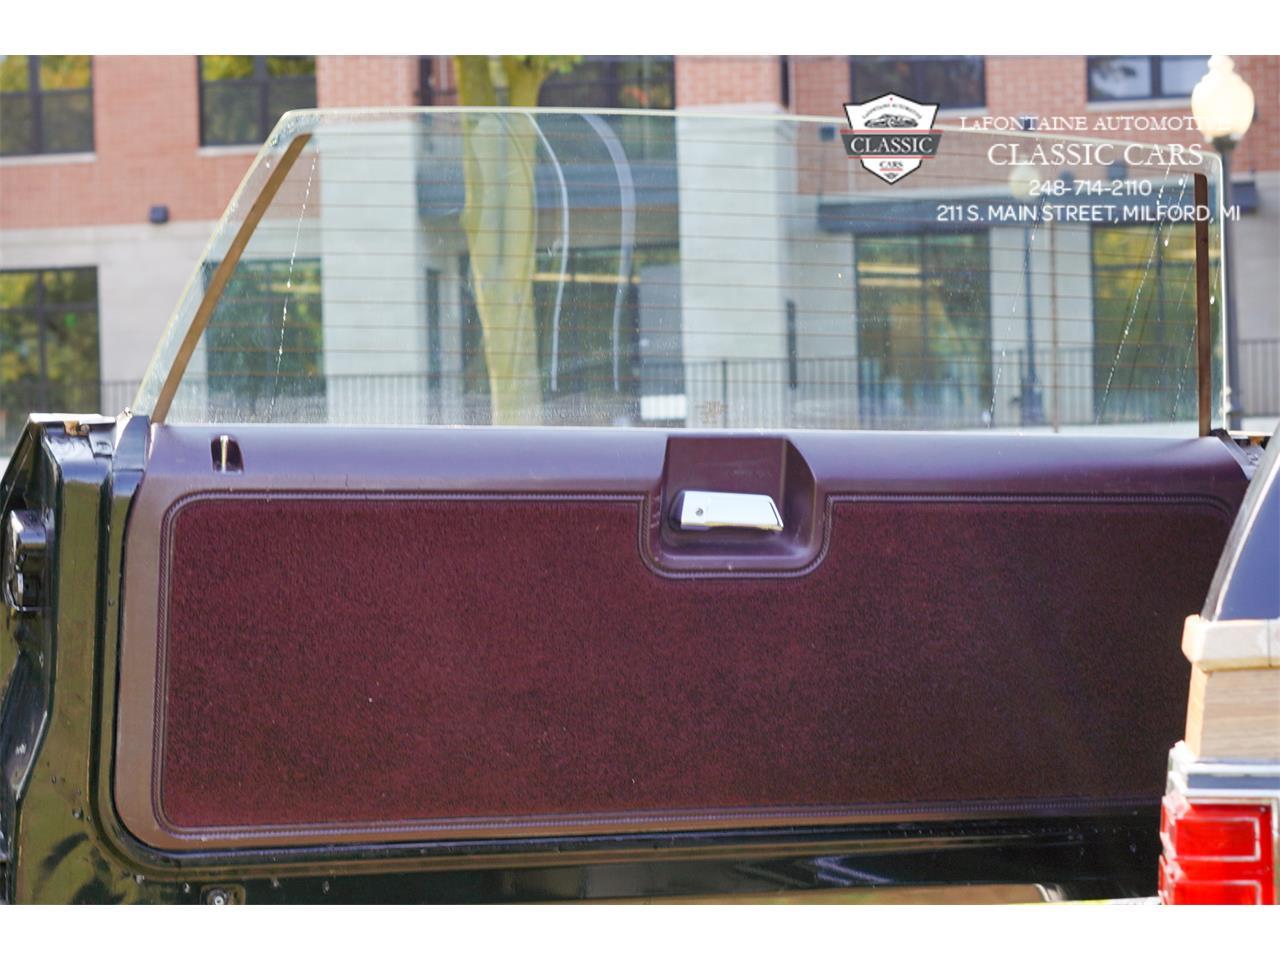 1986 Pontiac Parisienne (CC-1409457) for sale in Milford, Michigan